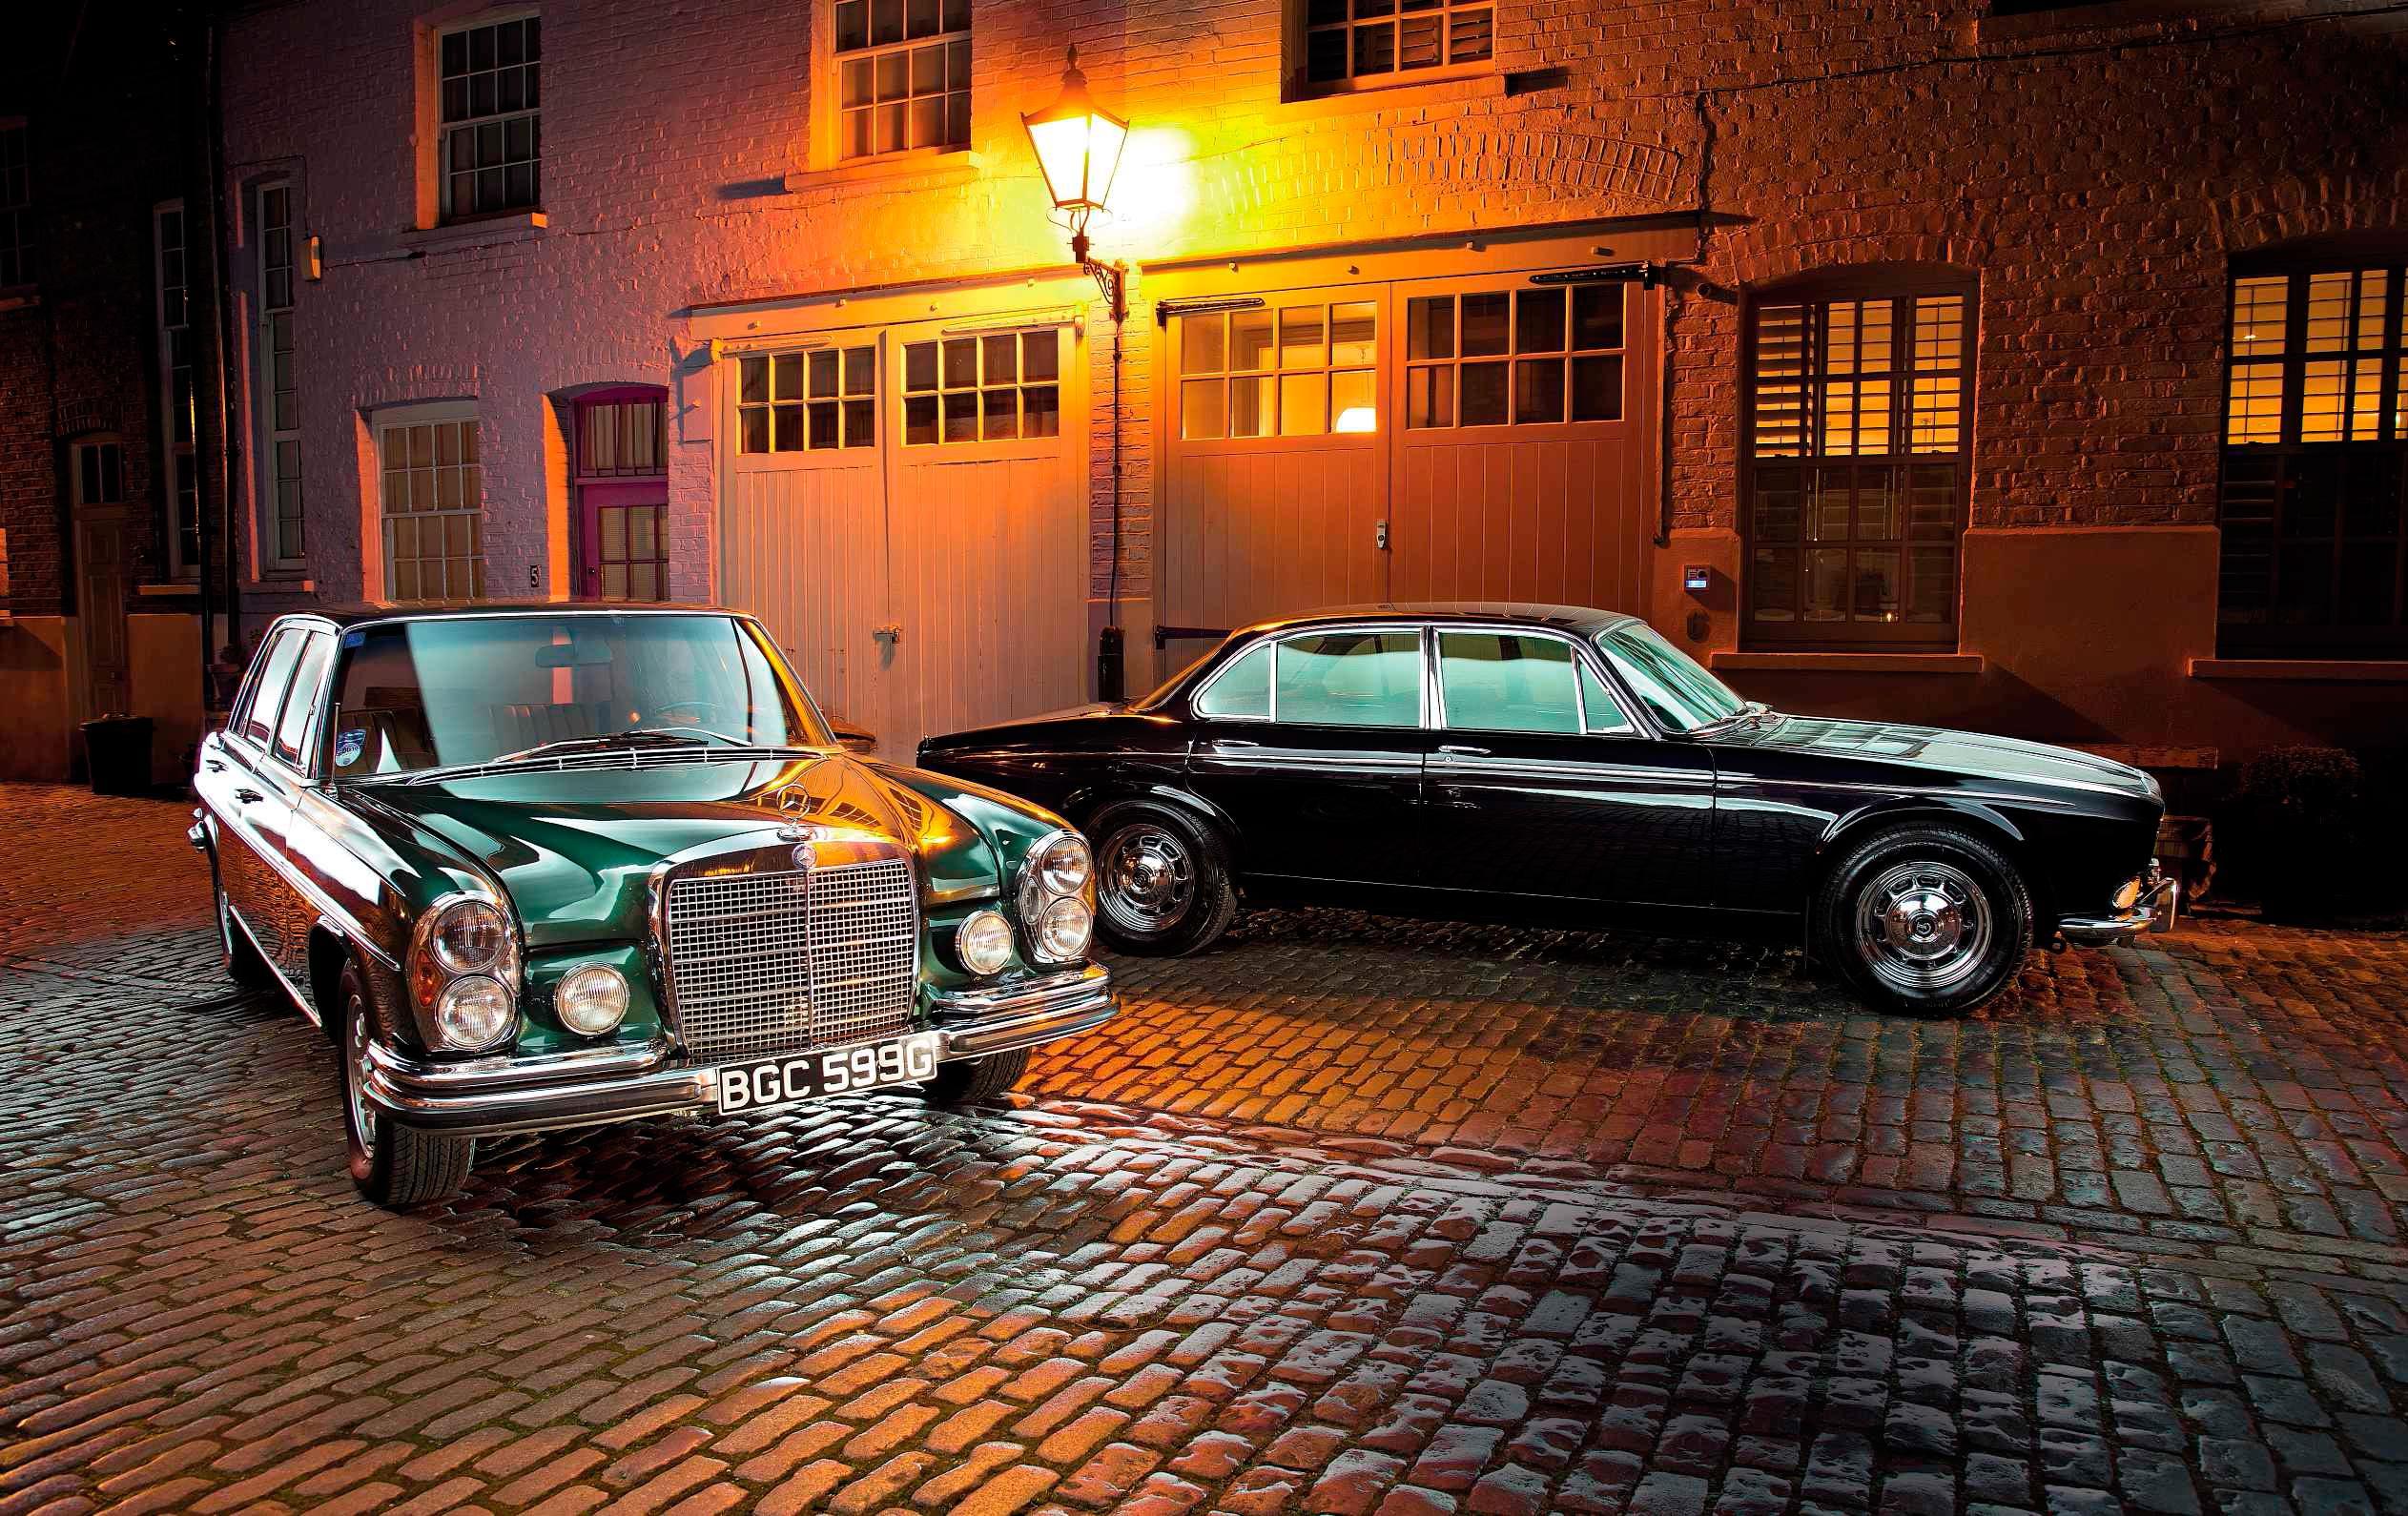 1972 Daimler Double Six vs. 1969 Mercedes-Benz 300SEL 6.3 W109